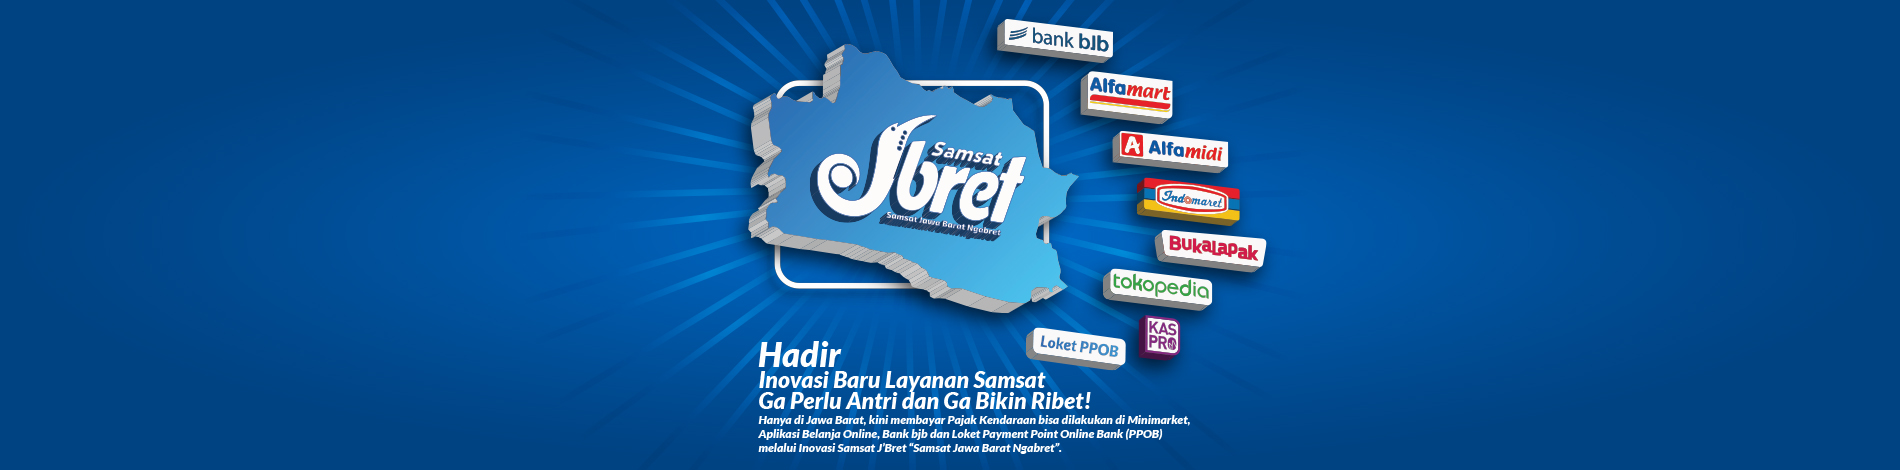 Banner Samsat Jbret Website